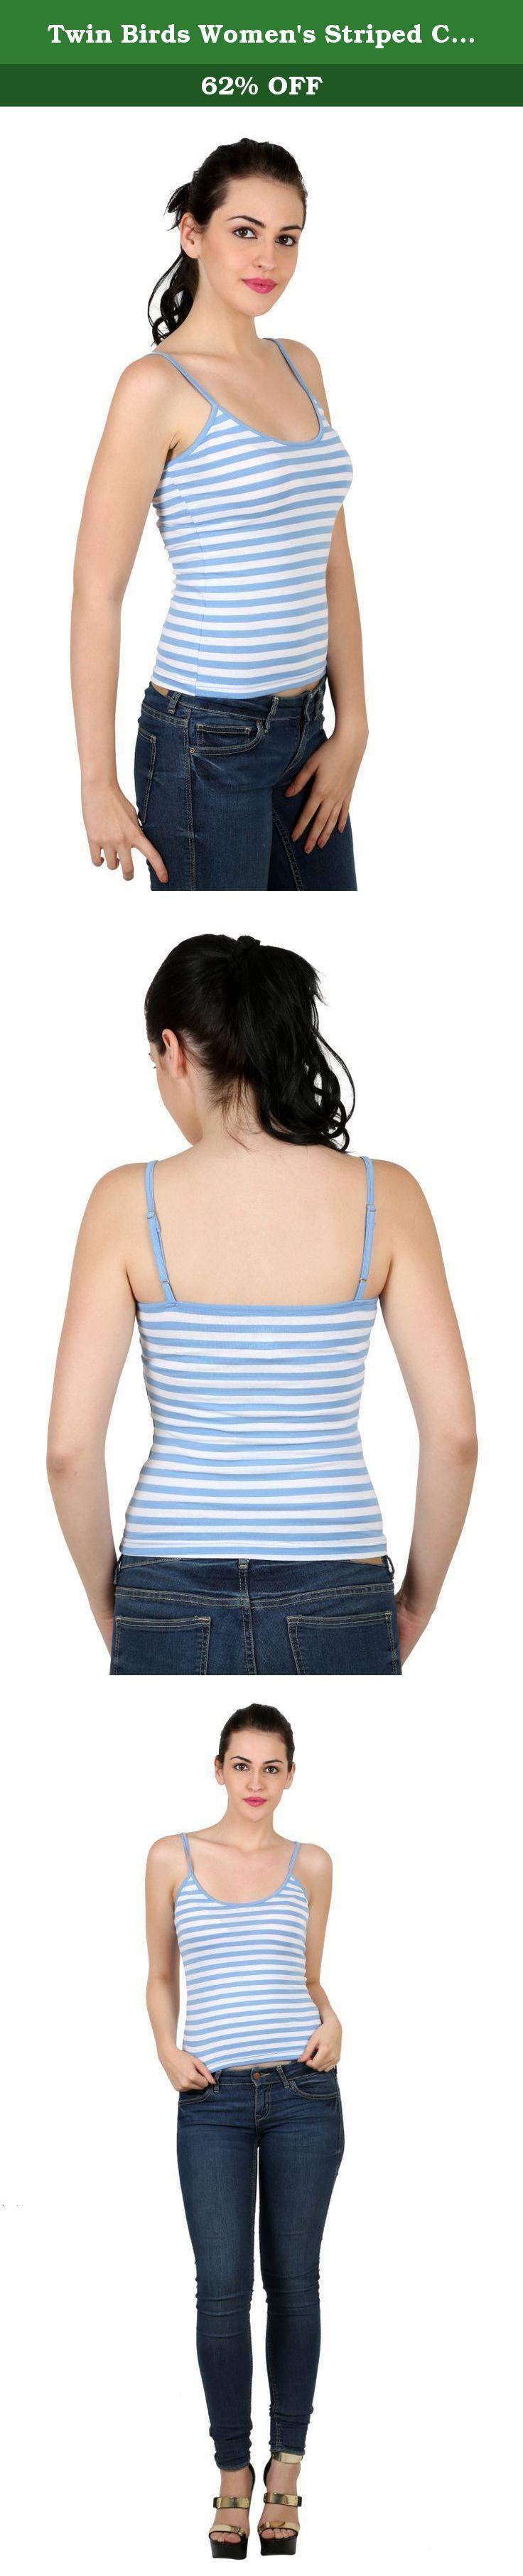 twin birds womens striped cotton jersey scoop neck adjustable spaghetti strap cami bluewhite